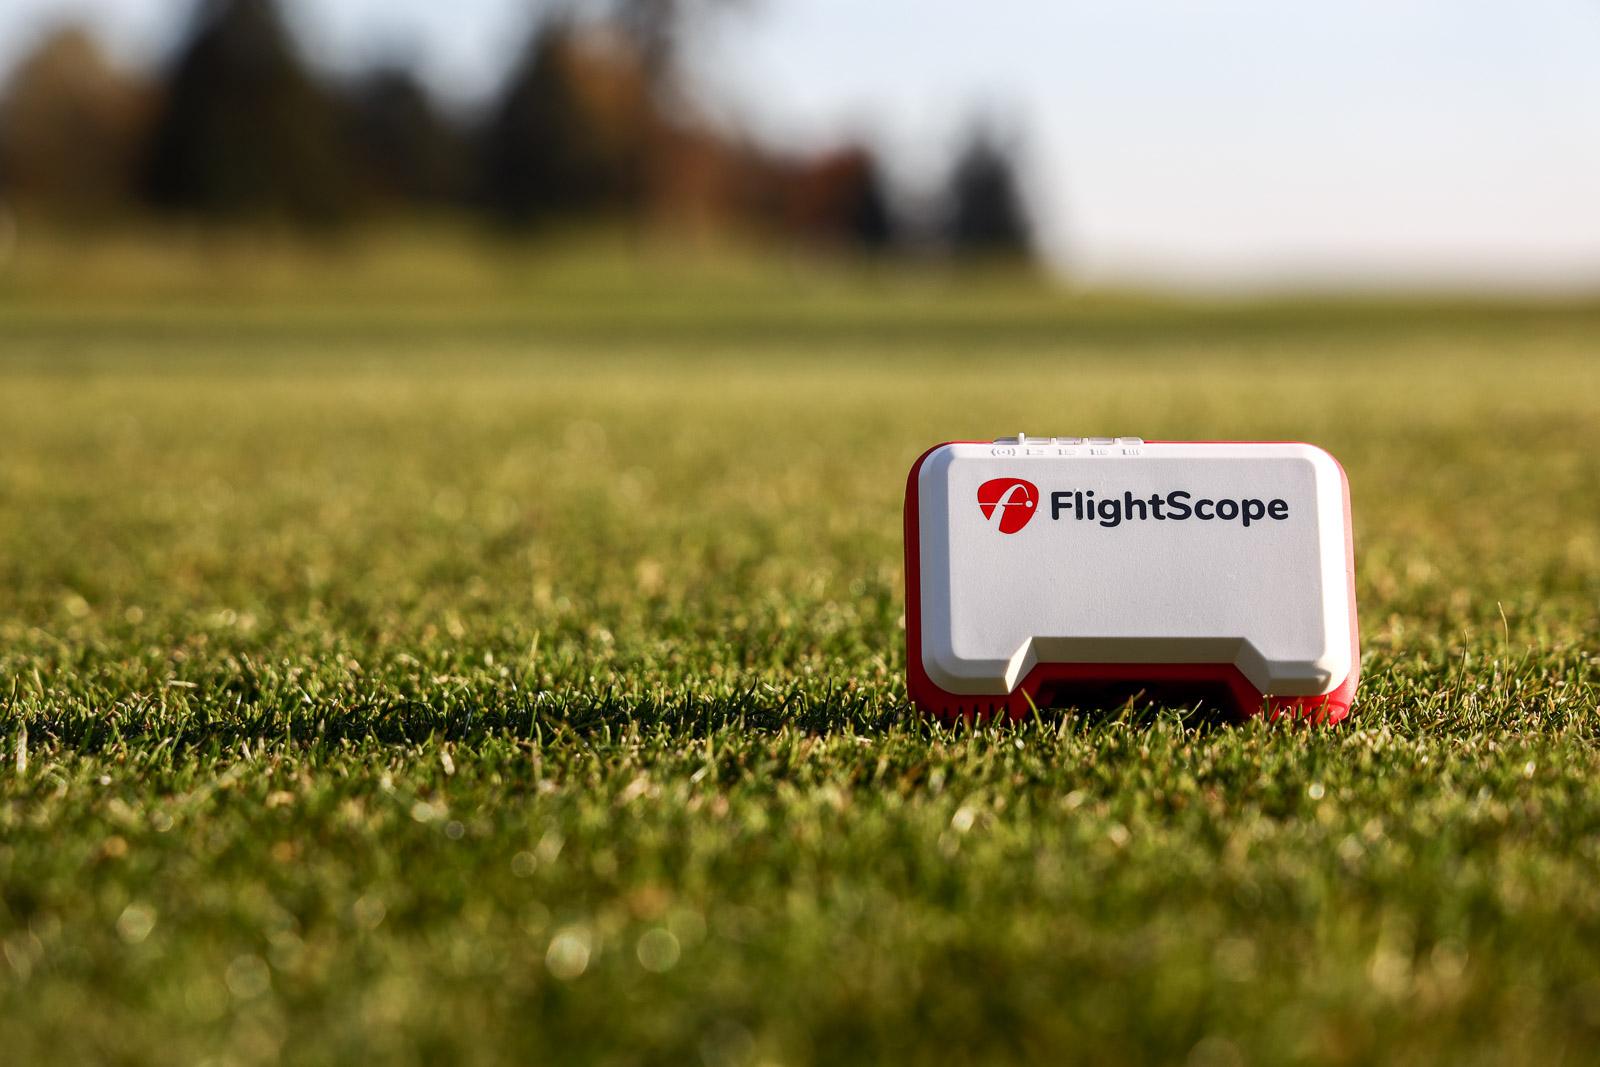 FlightScope Mevo -Get 10% off with